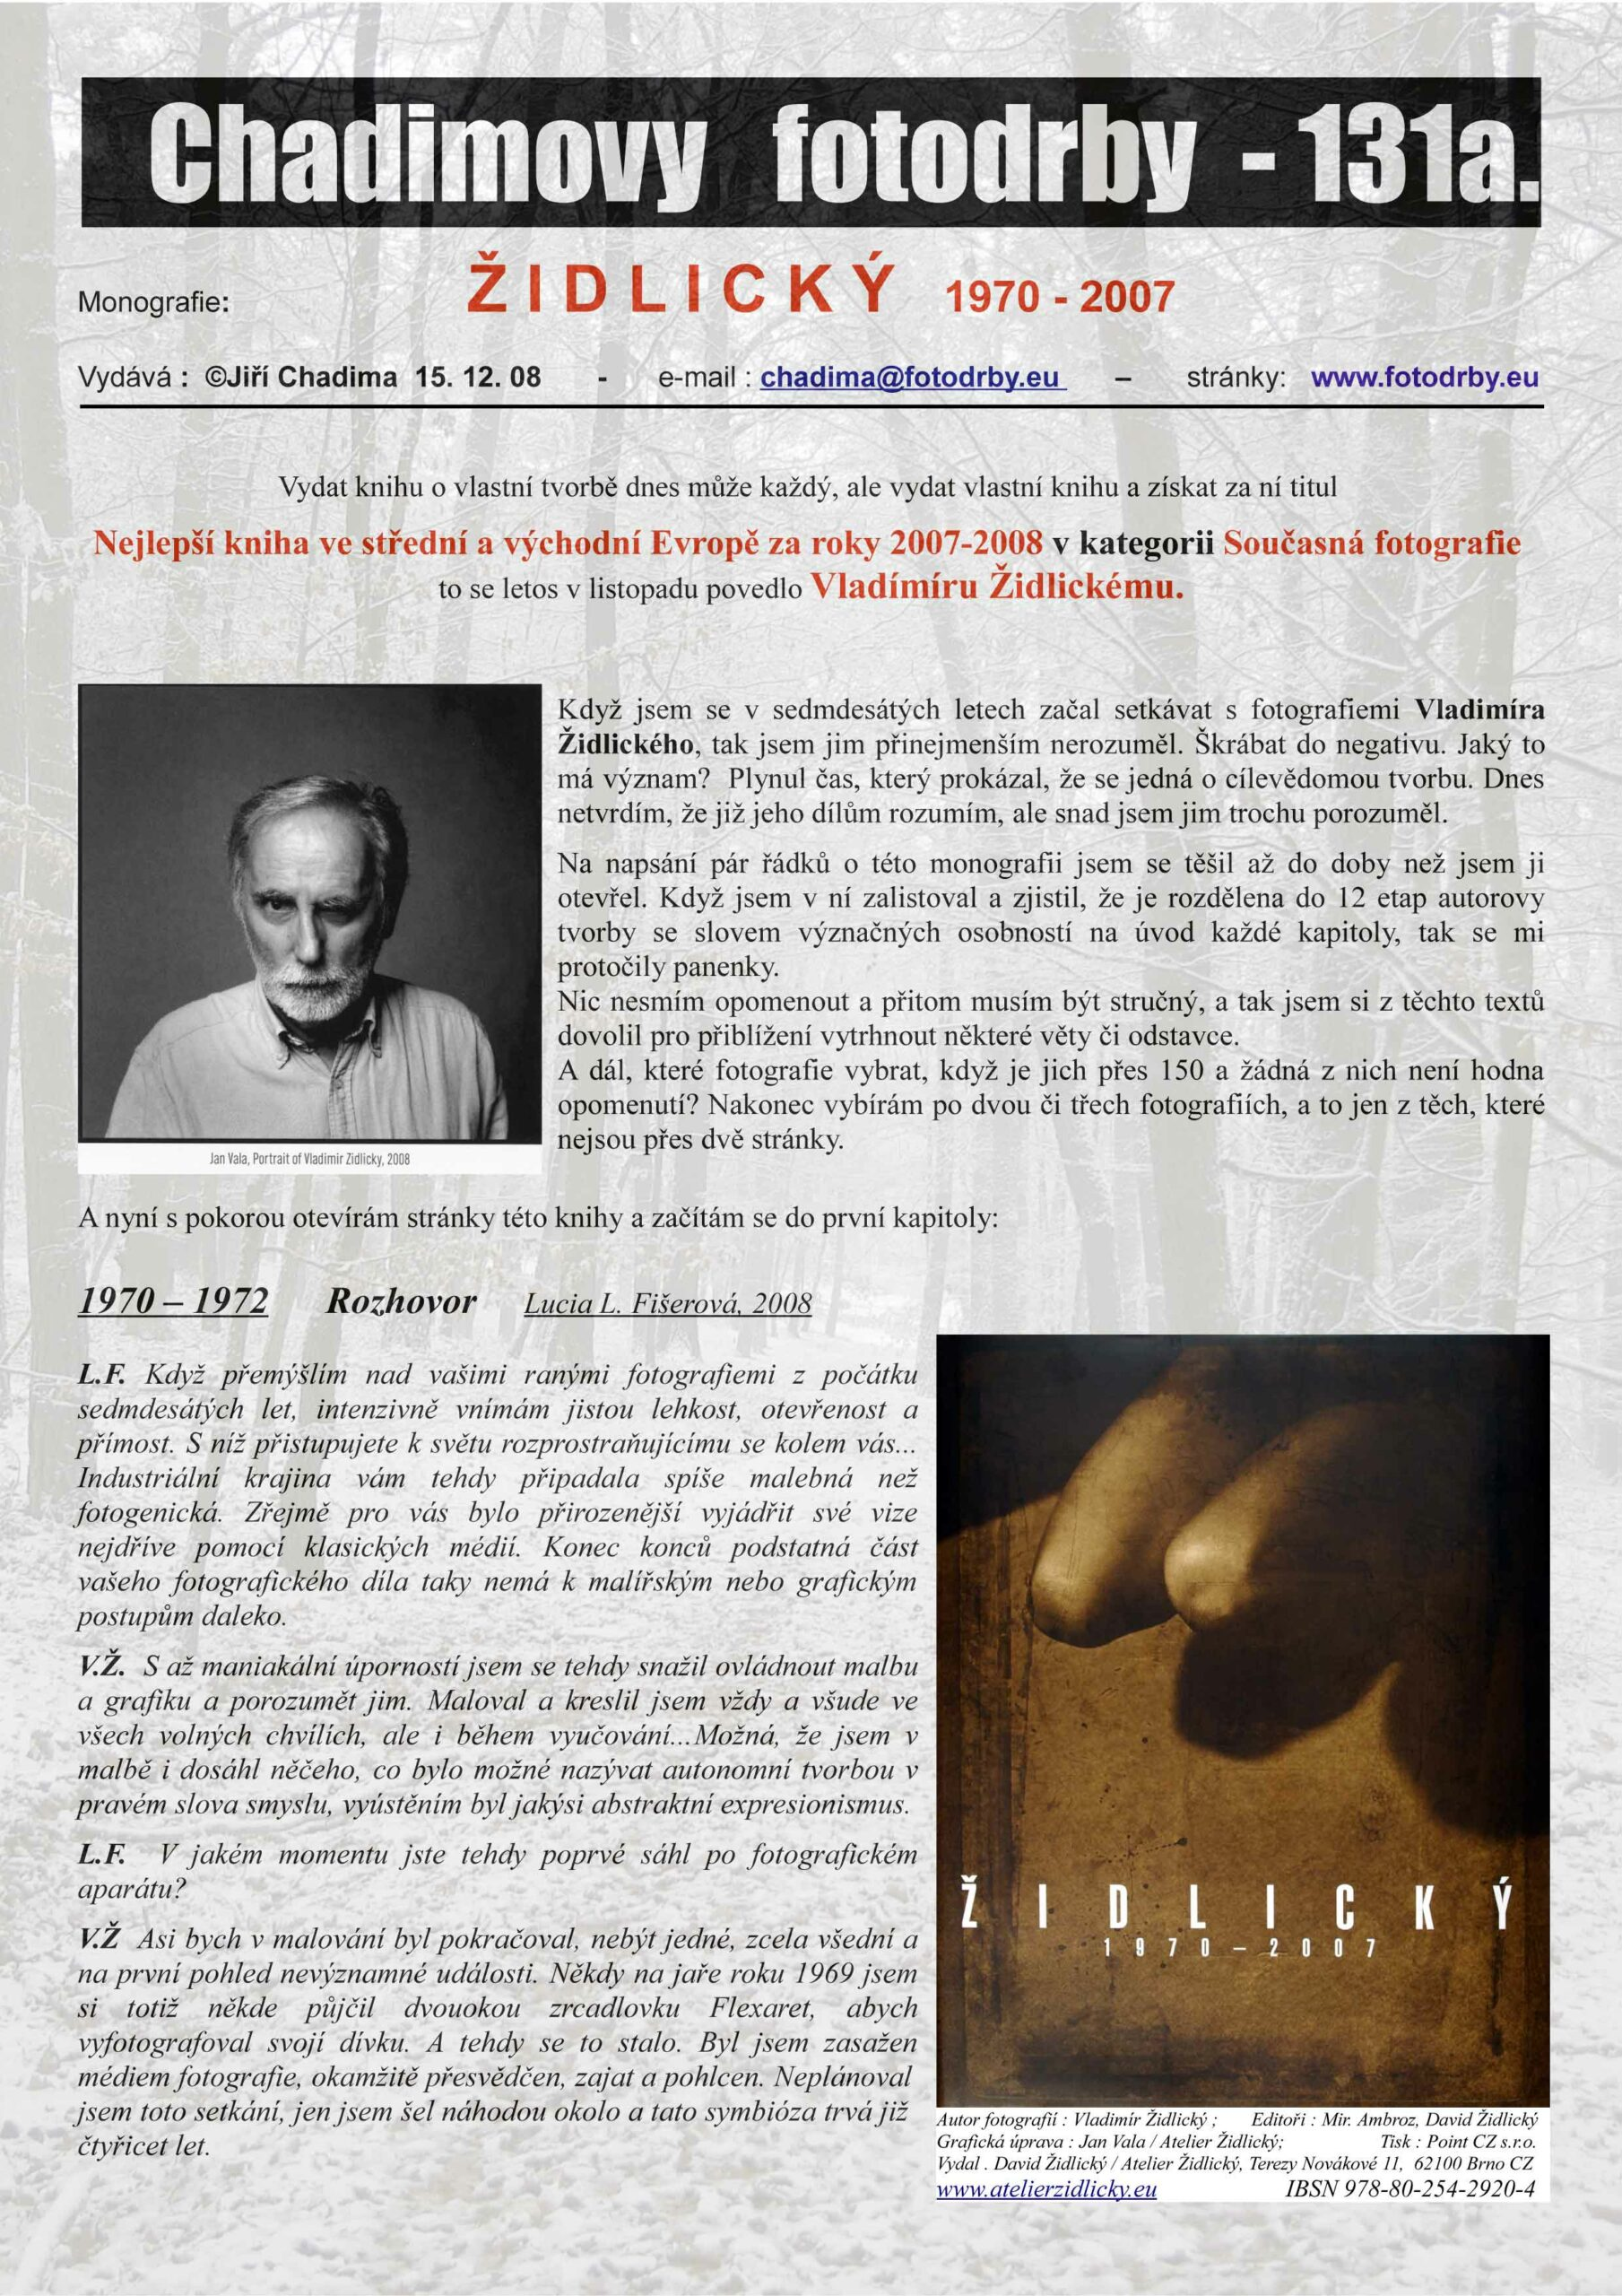 Fotorevue 131a – ŽIDLICKÝ (1970 – 2007)